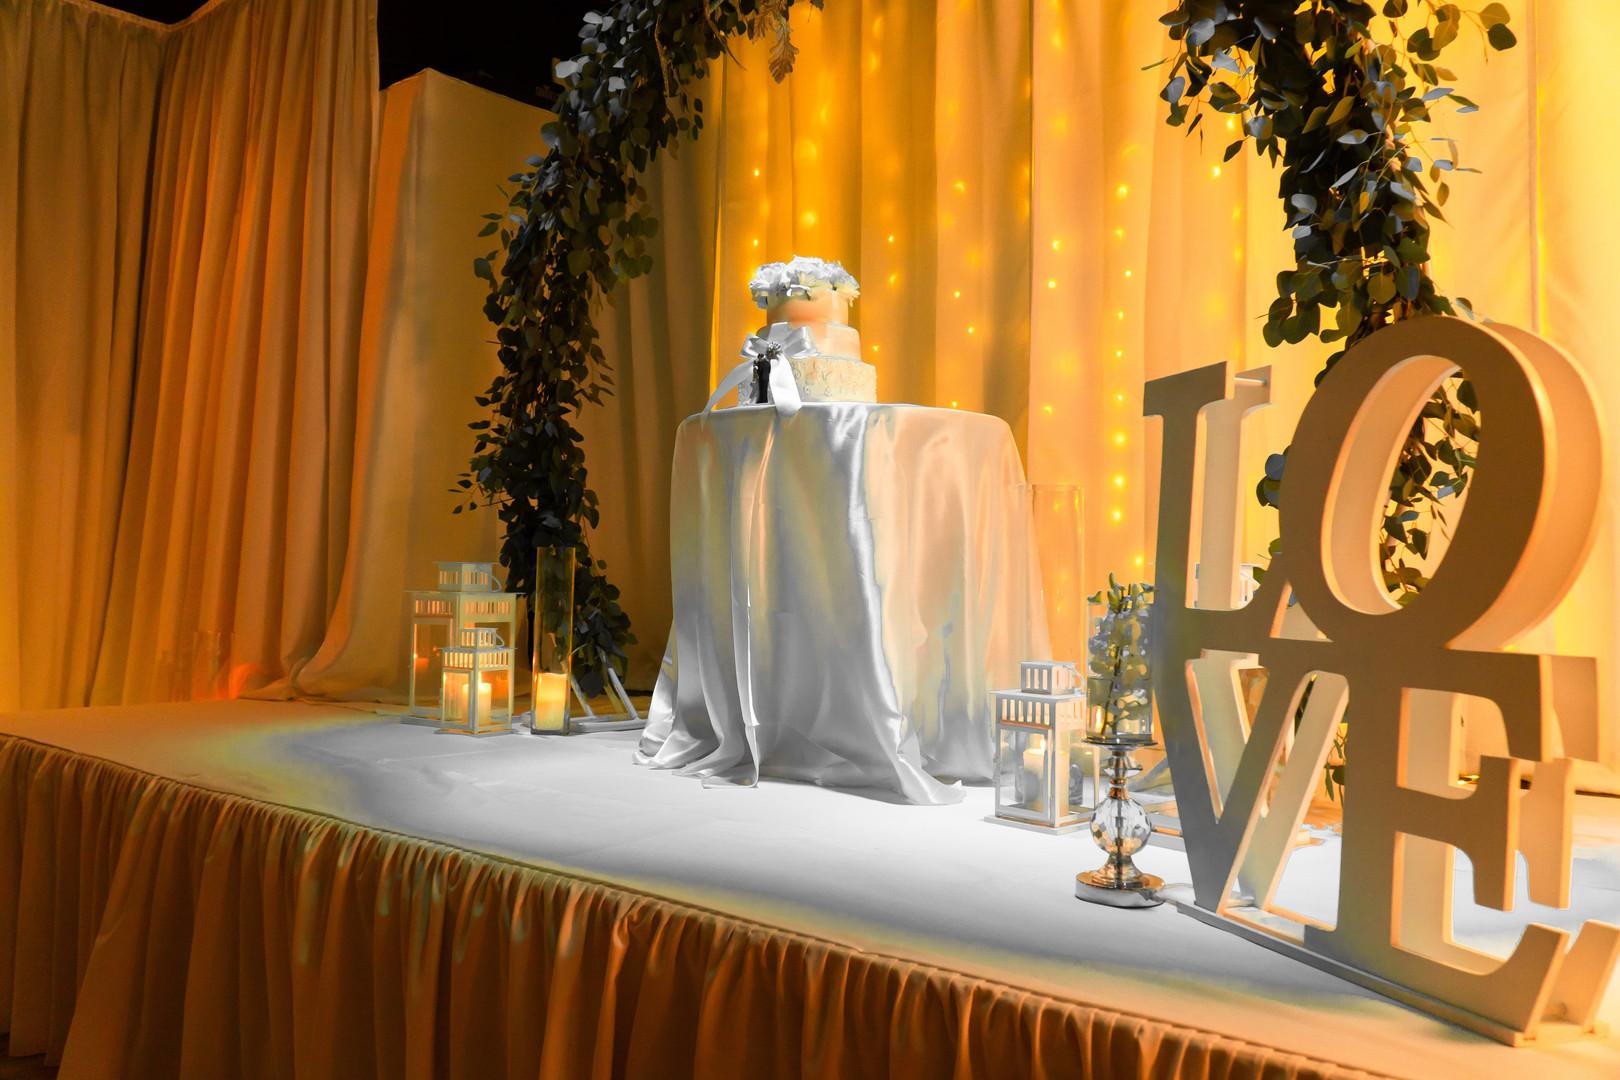 Wedding venue in Kendall Miami wotj